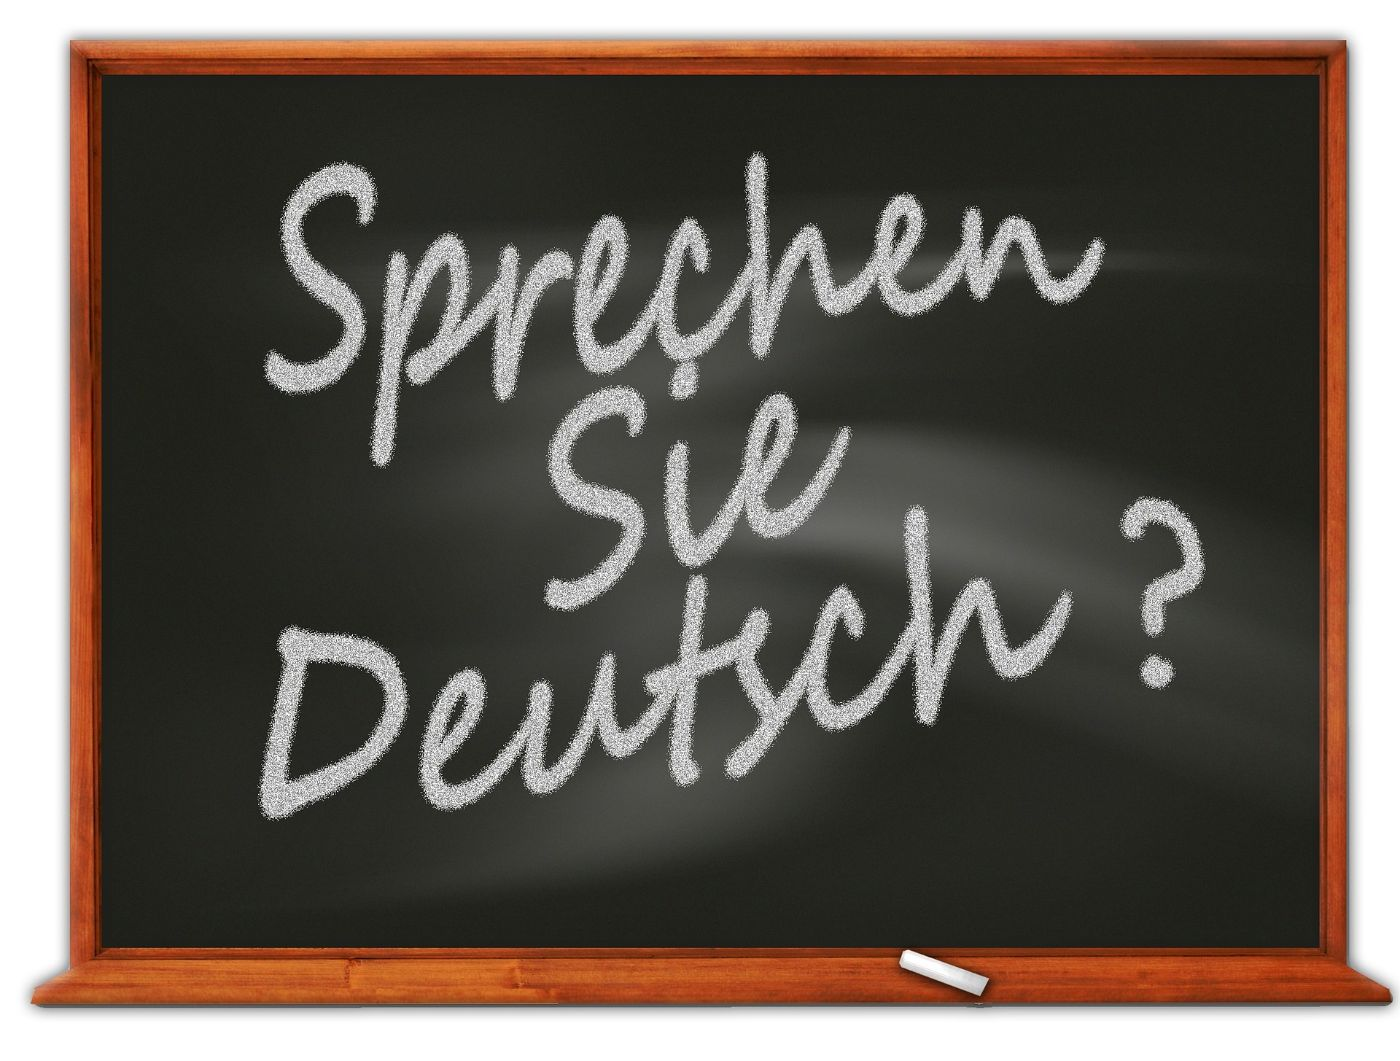 Sprechen Sie Deutsch written on a blackboard